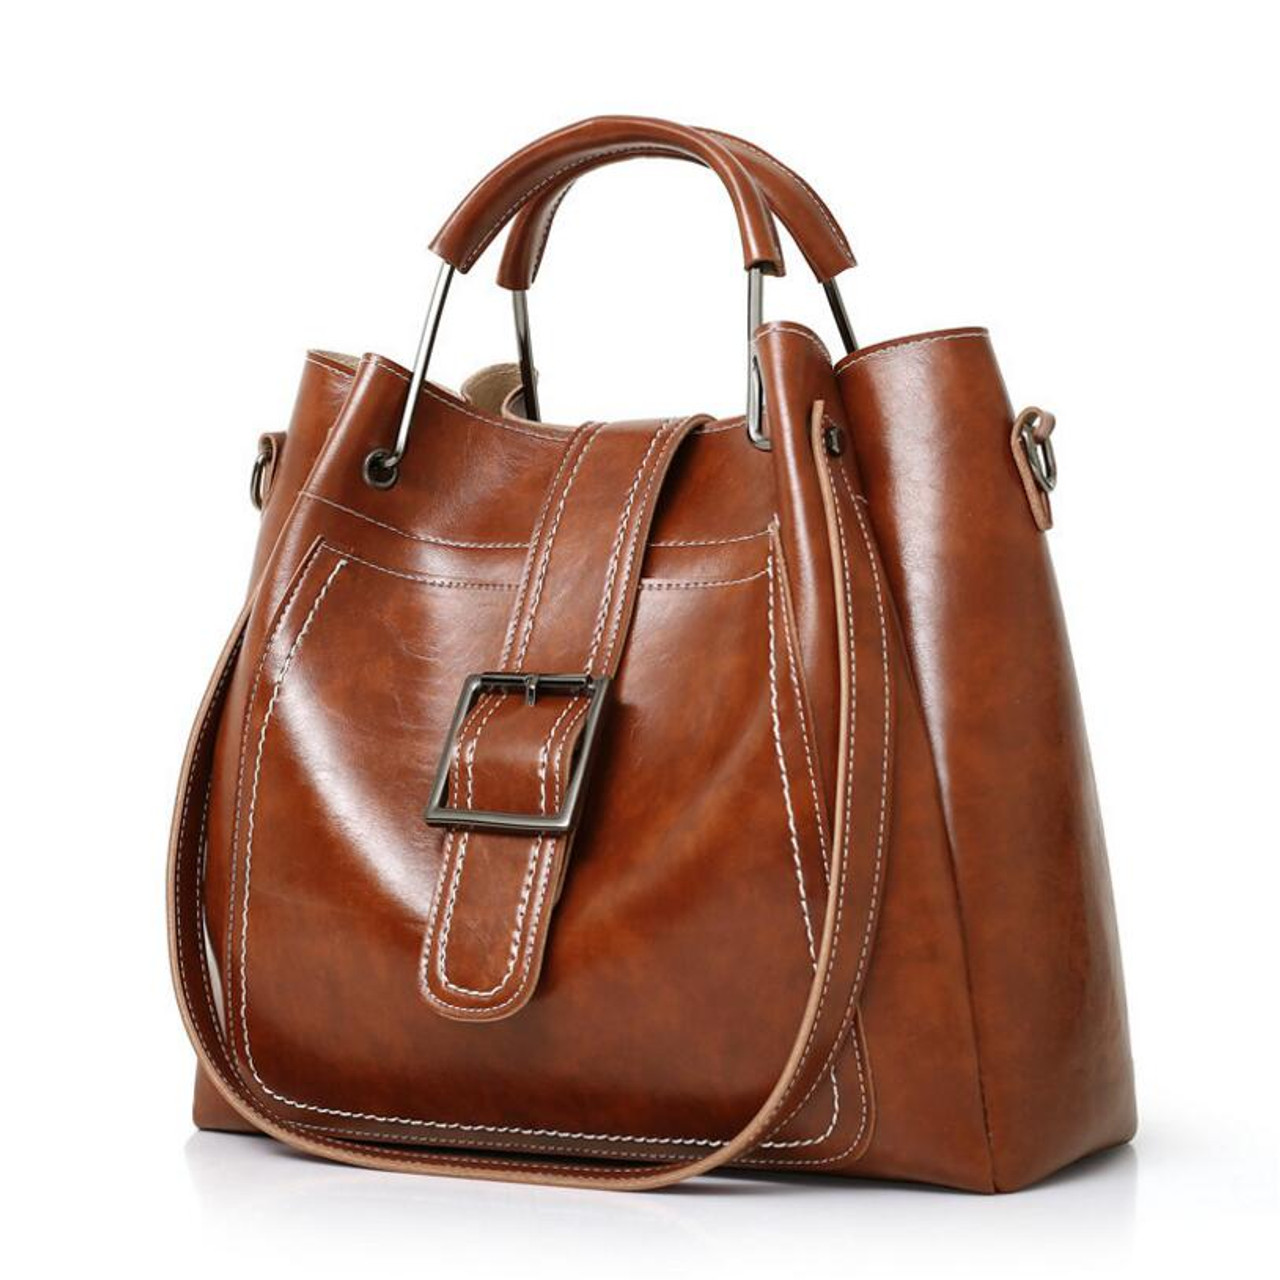 ... Sisjuly Women Bags Leather Luxury Handbags Famous Brands Female  Shoulder Bags Designer Crossbody Bags For Women s ... 834b8133454fb